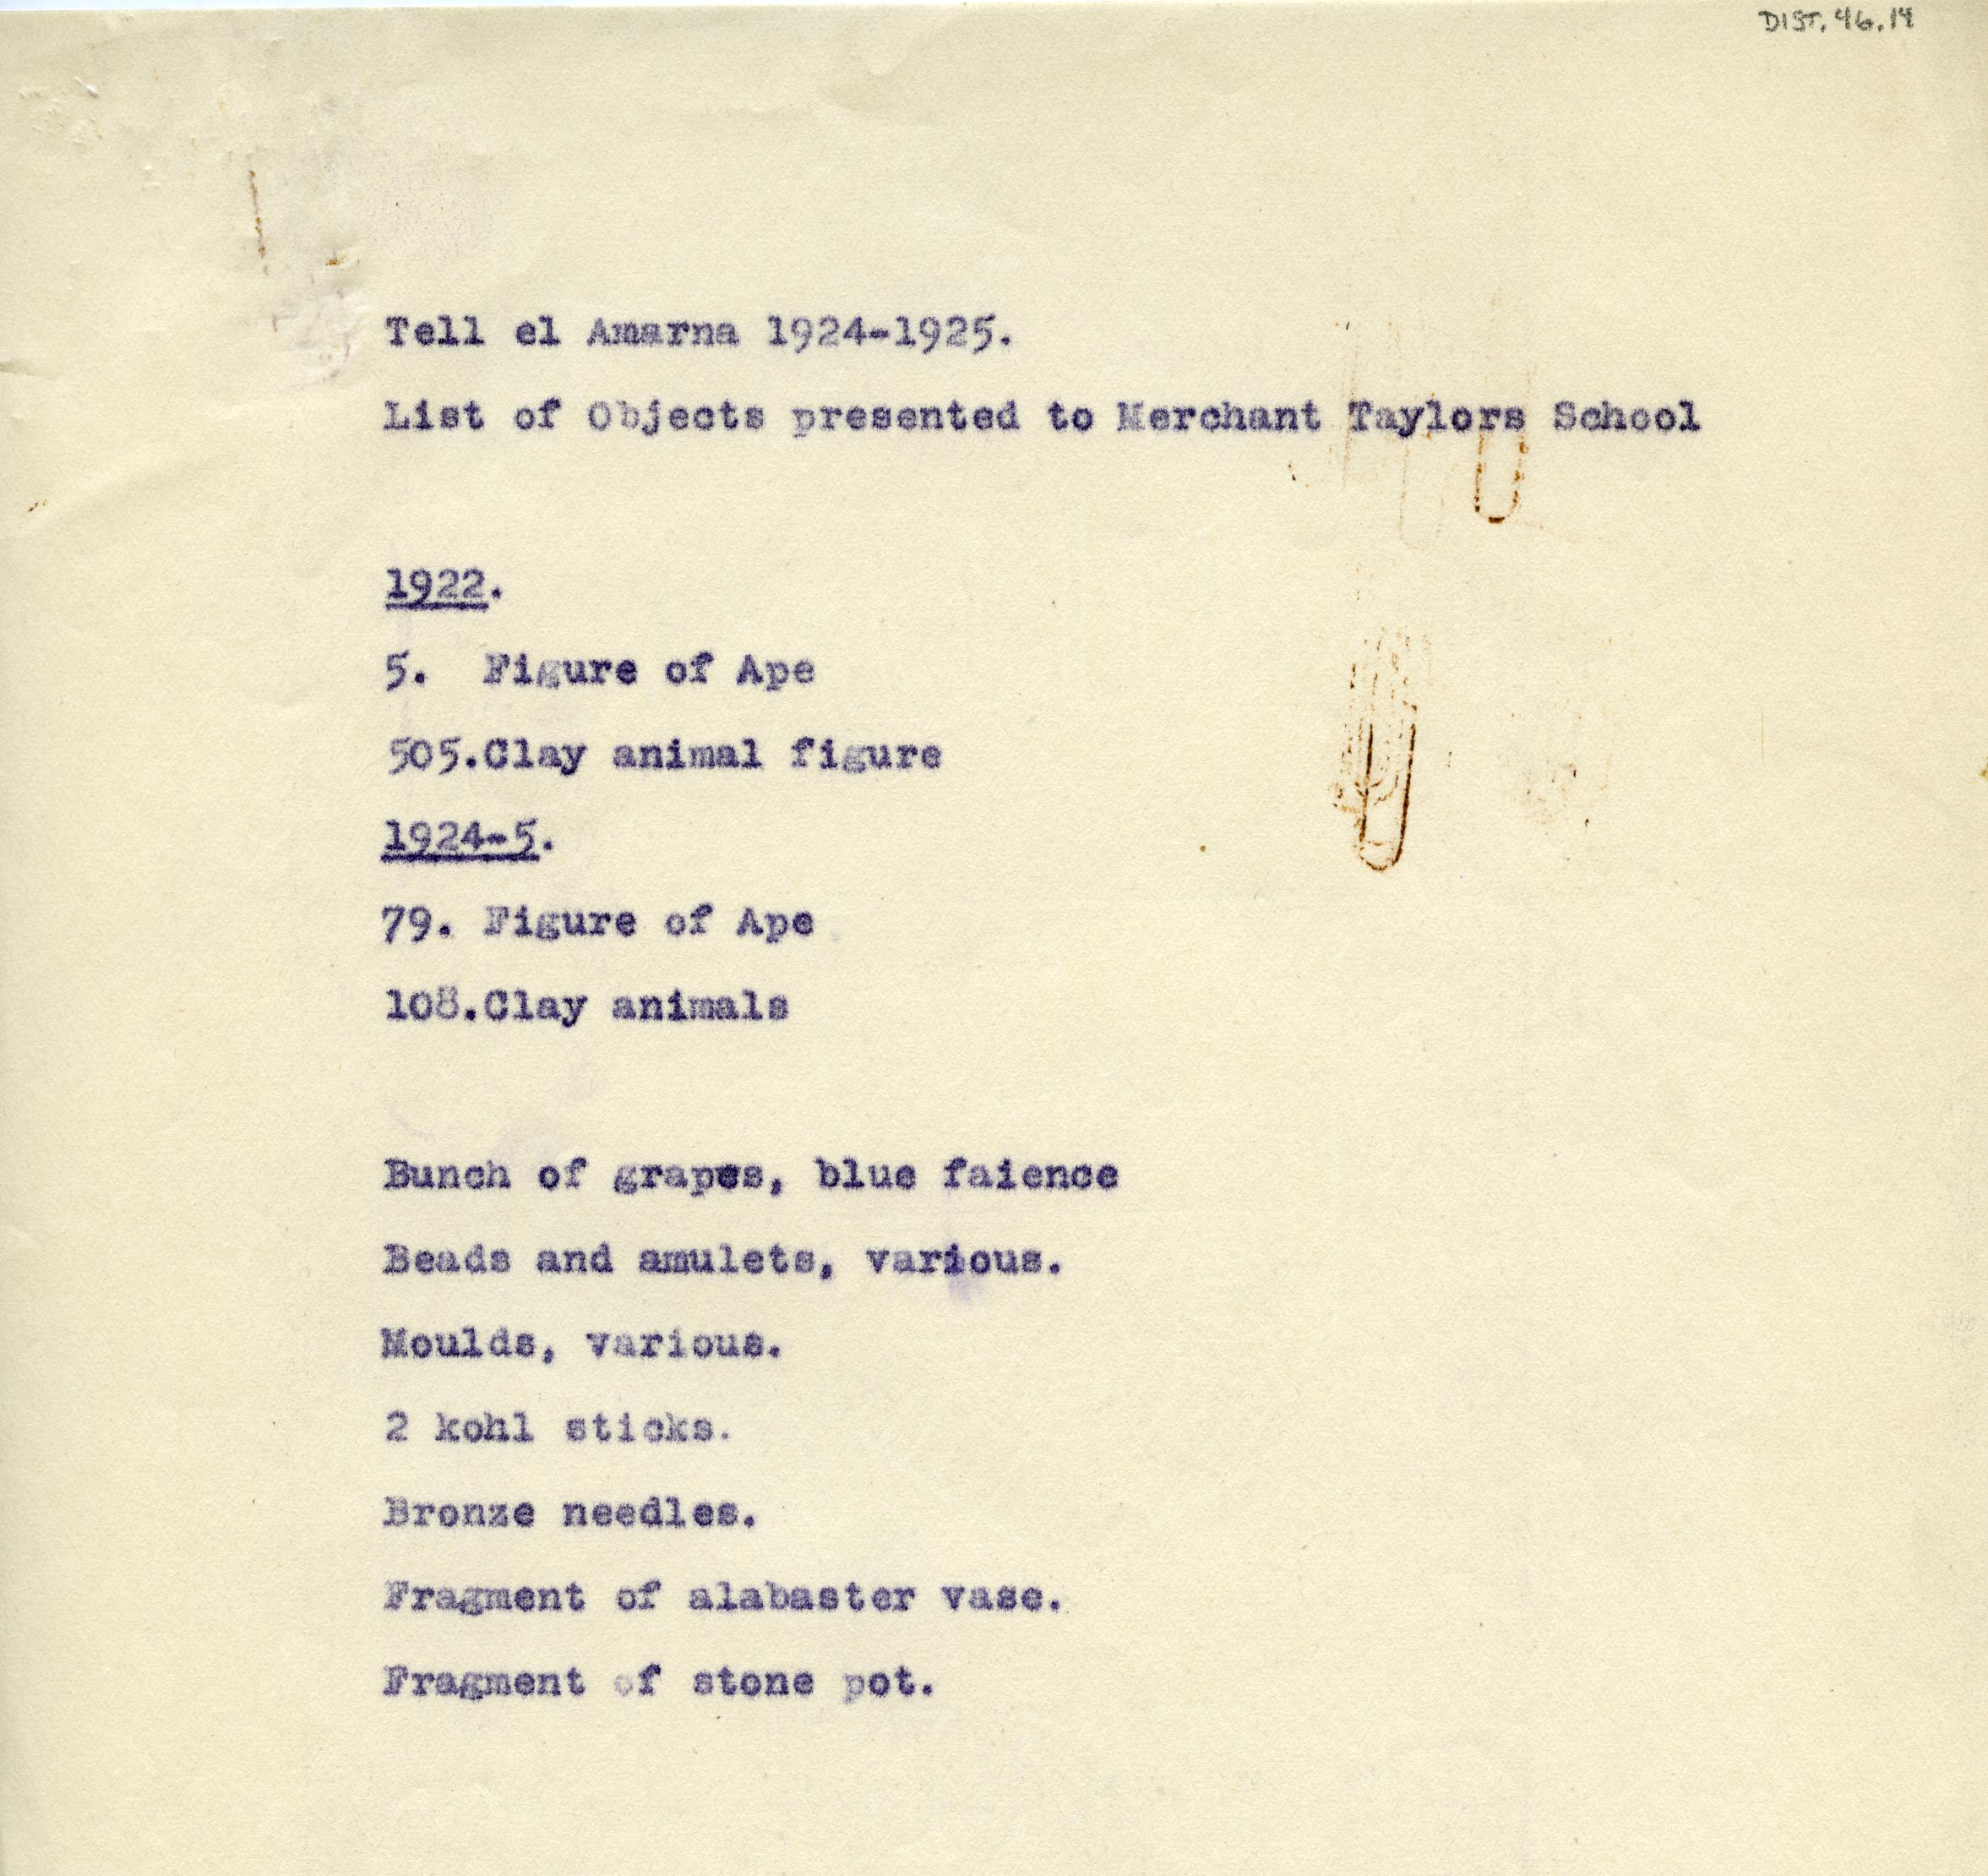 1921-25 el-Amarna DIST.46.14